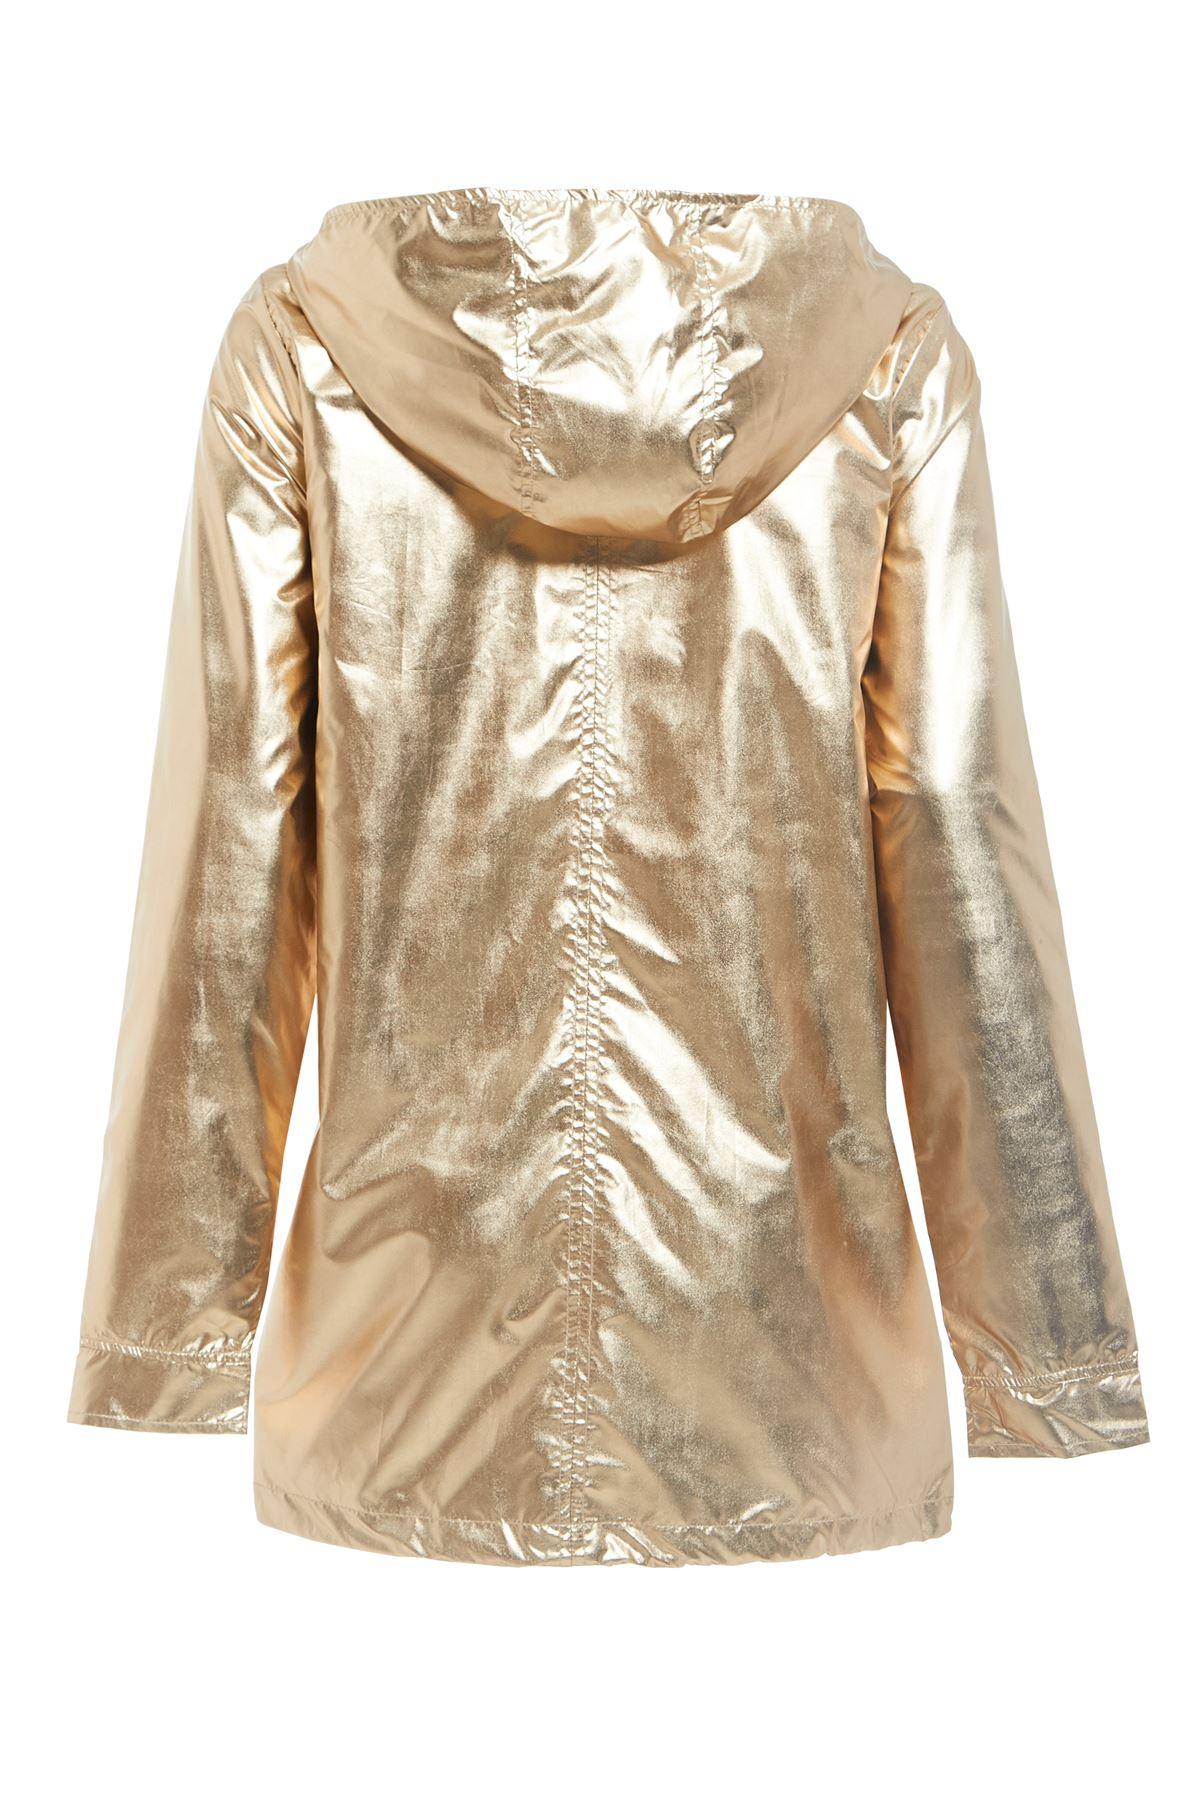 New-Womens-Hooded-Zipped-Metallic-Festival-Jacket-Top-Kagool-Mac-Raincoat-8-16 thumbnail 3